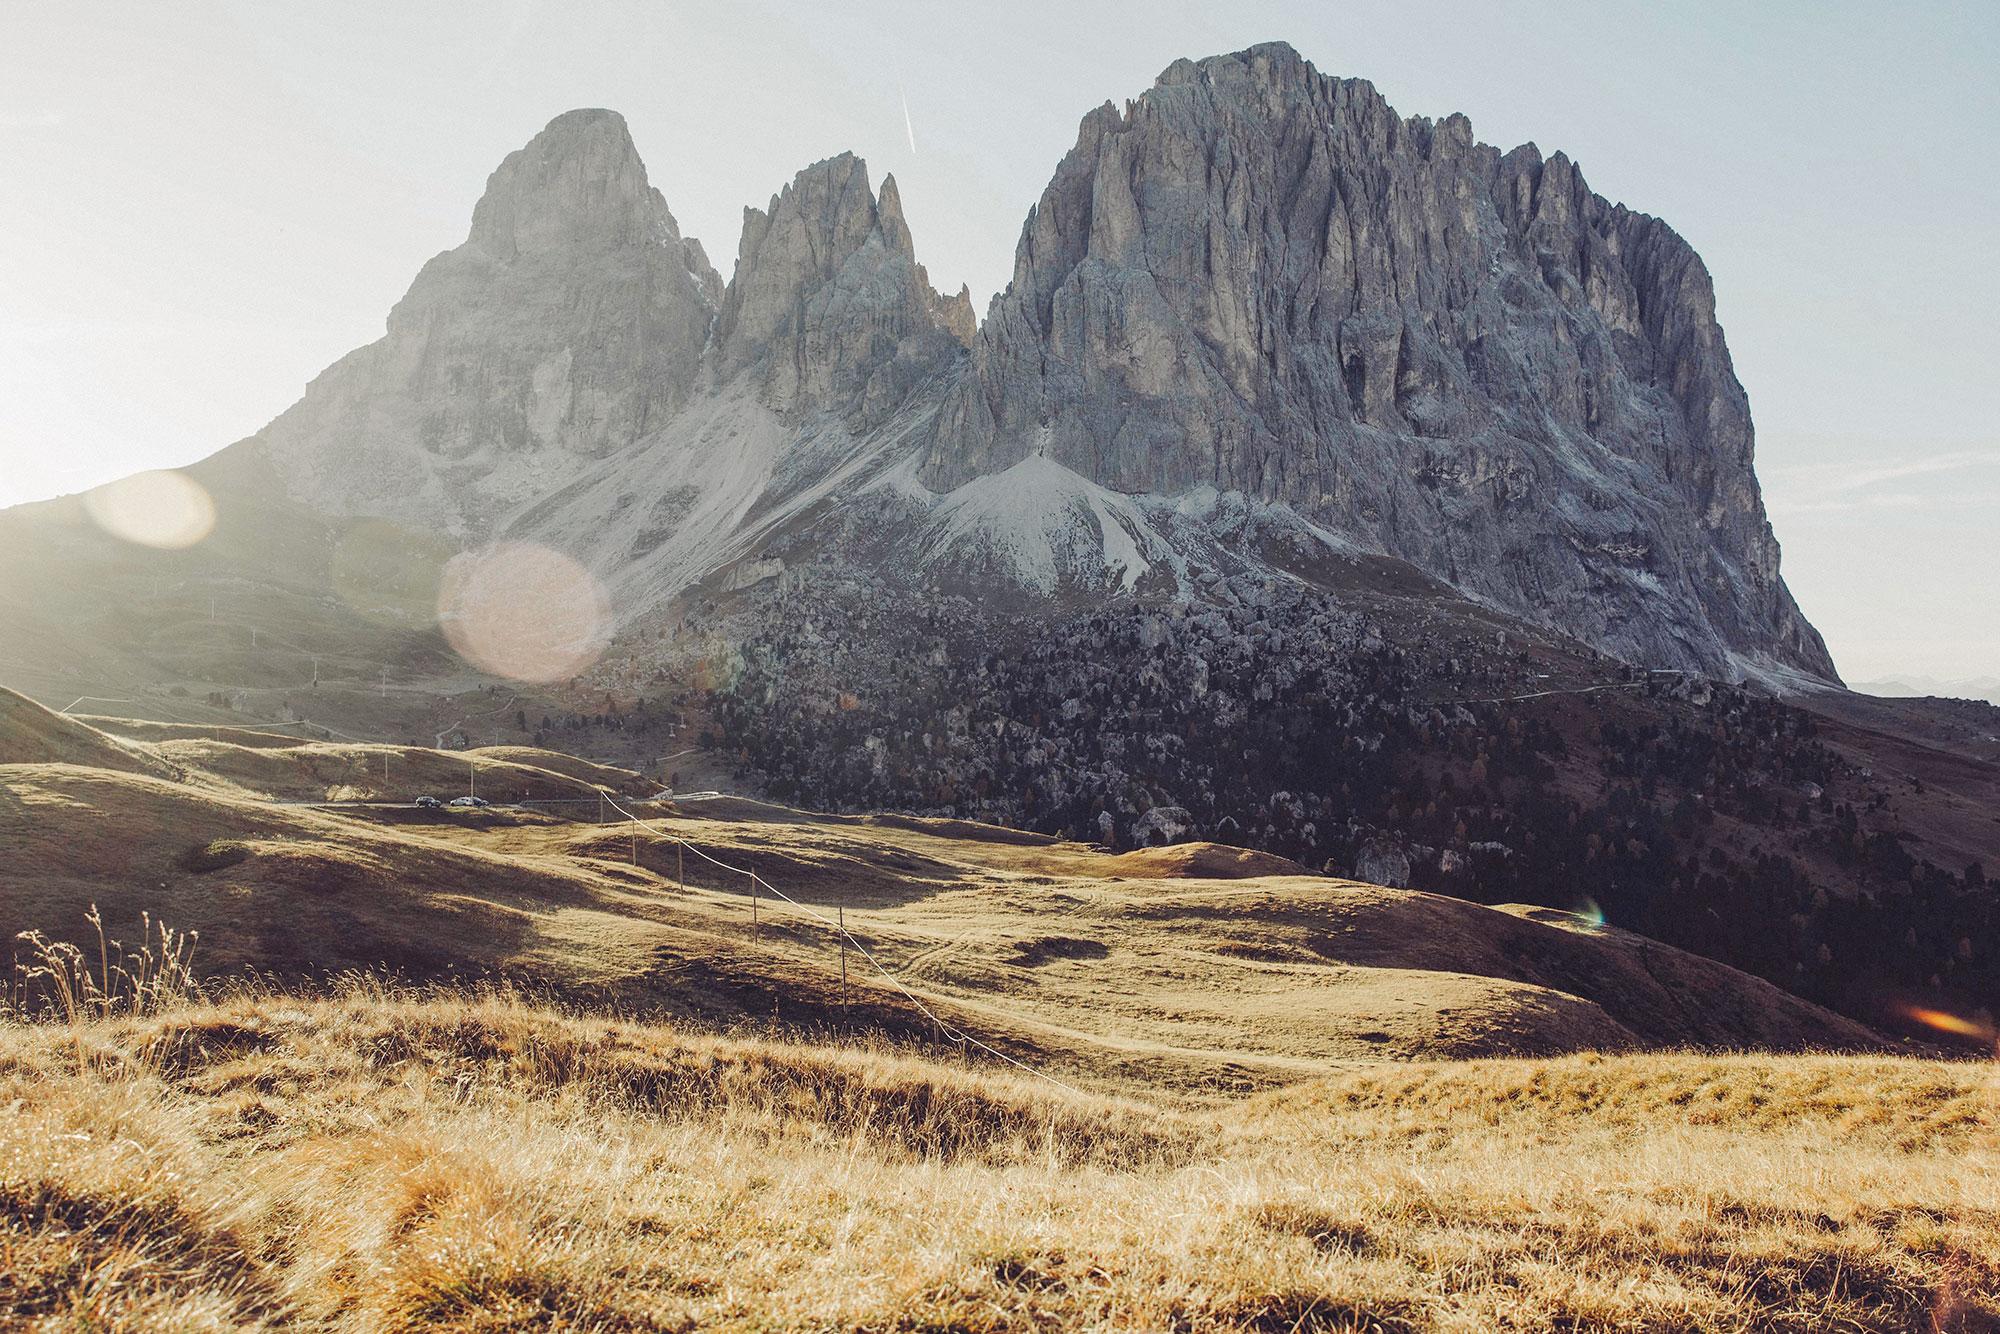 The-dolomites-italy-autumn-october-2017-mountains-prominence.jpg